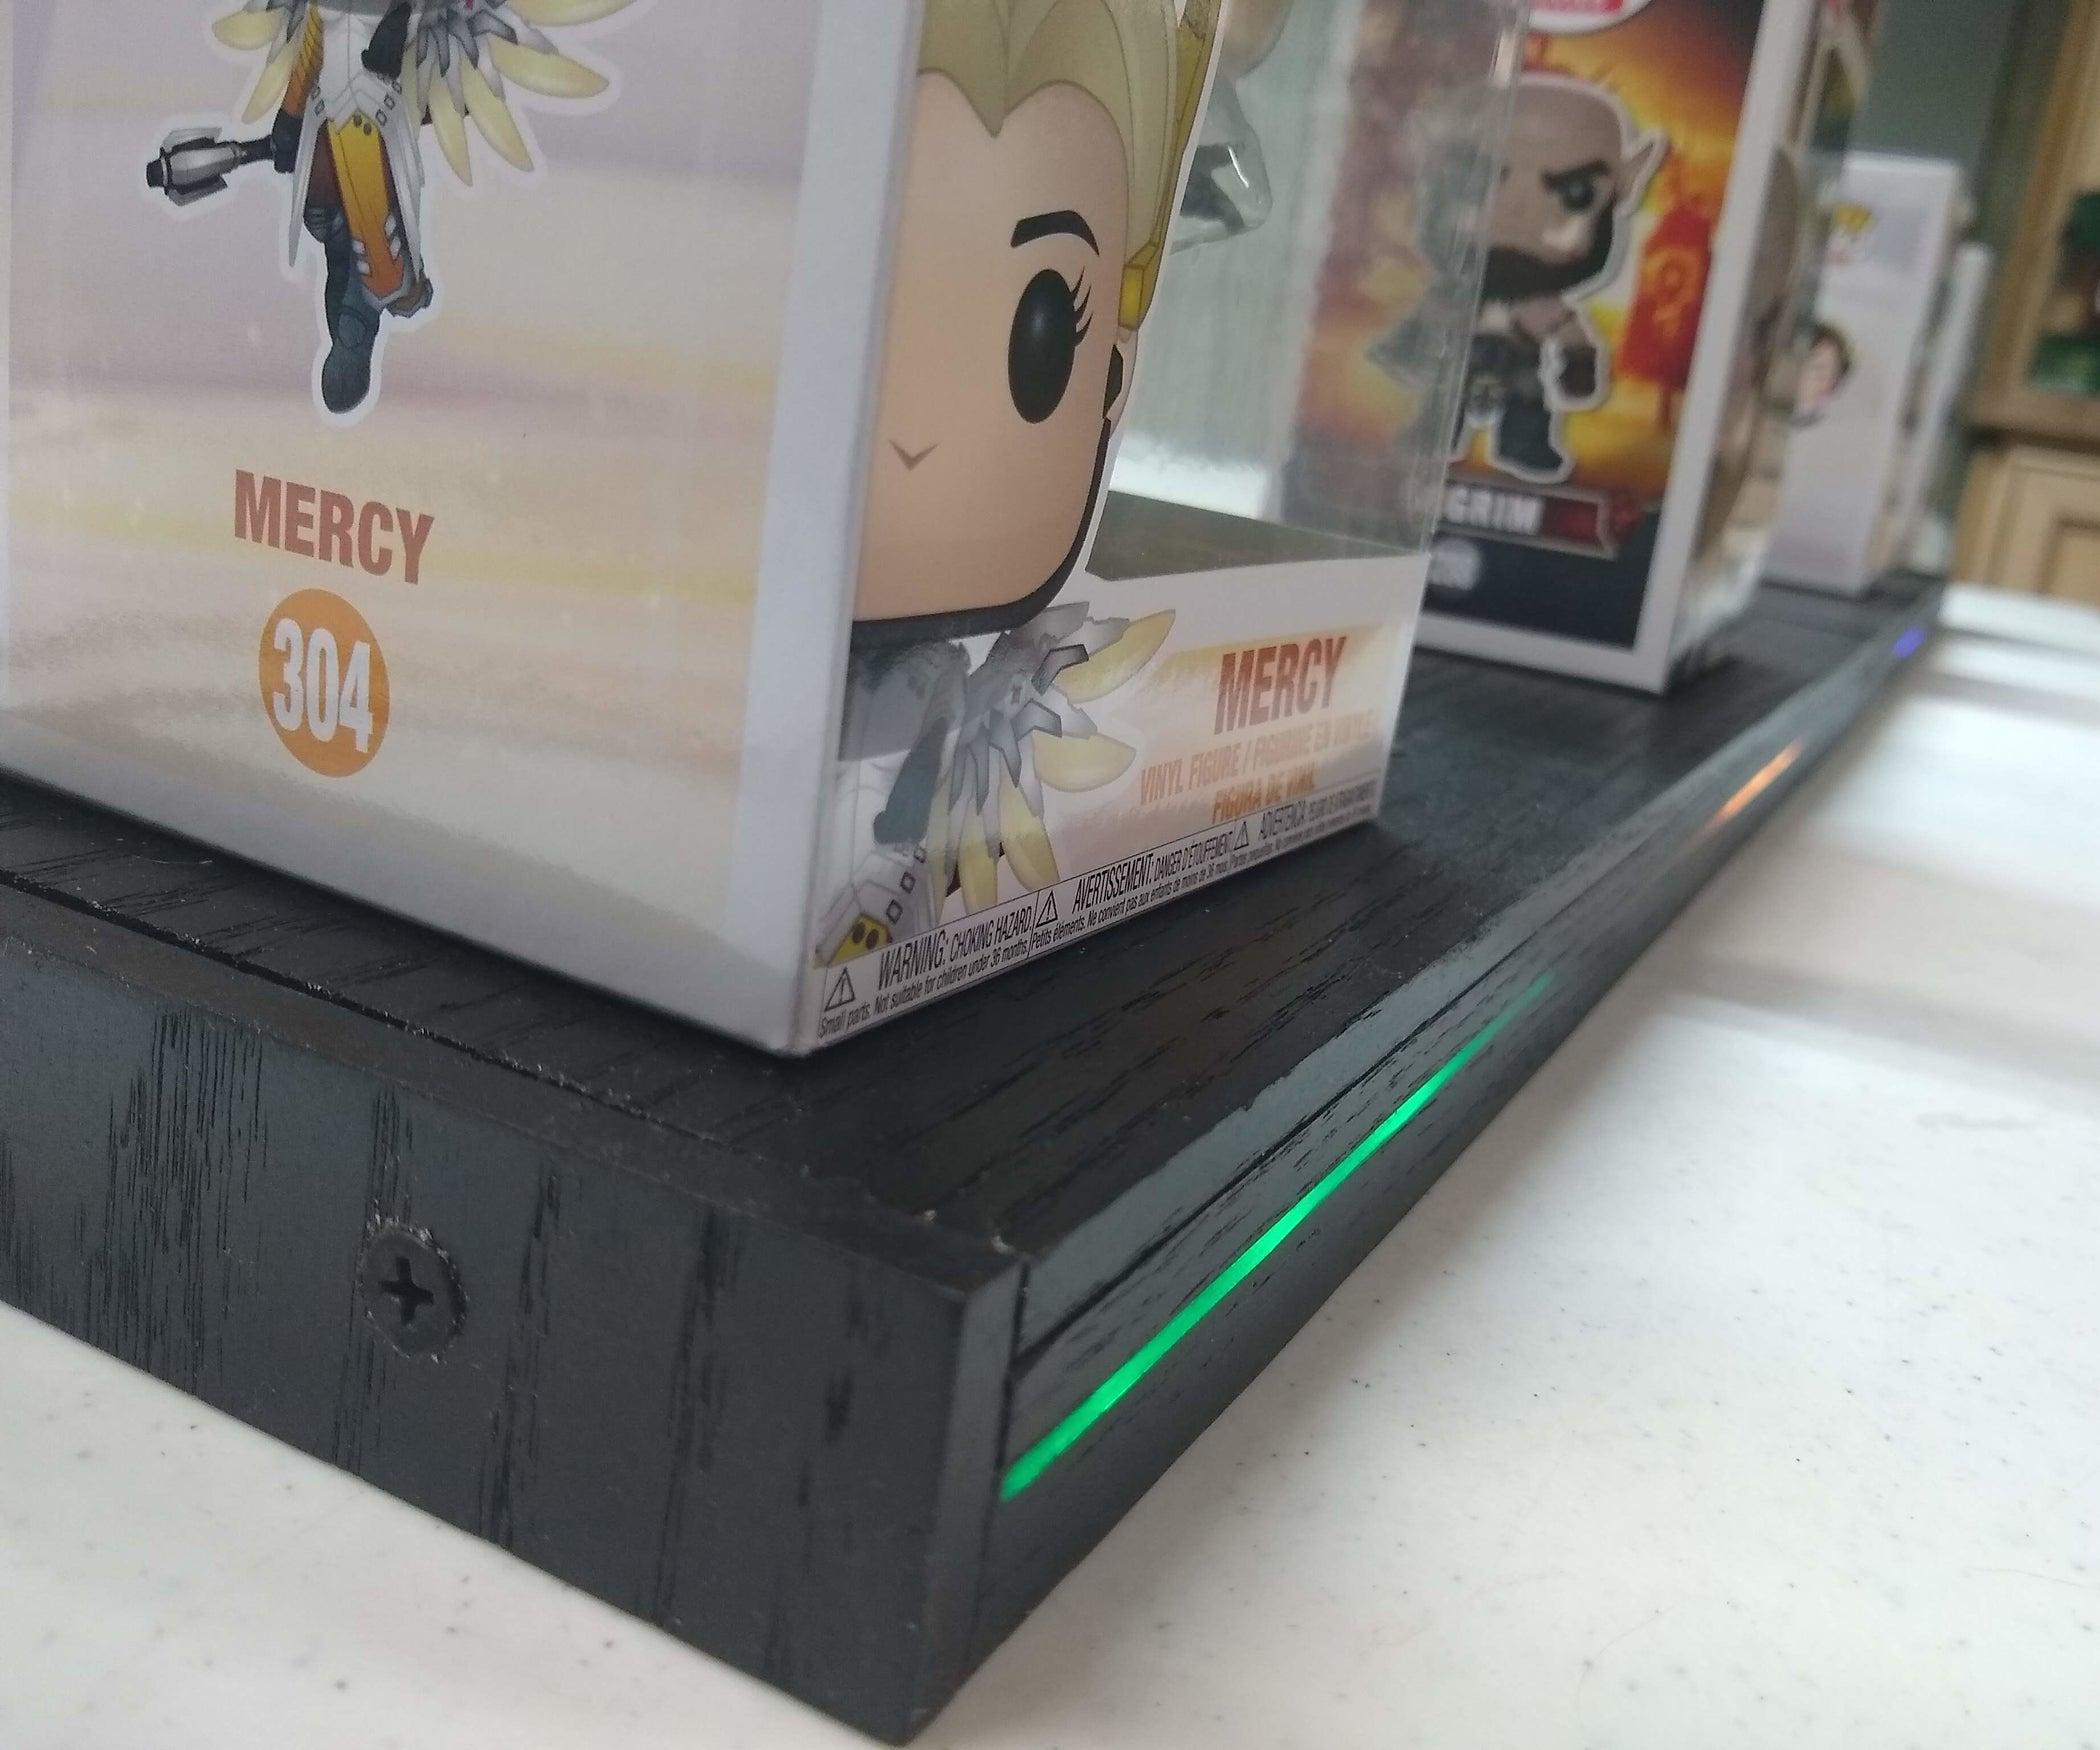 Steam Linked Display Shelf - RapidAPI